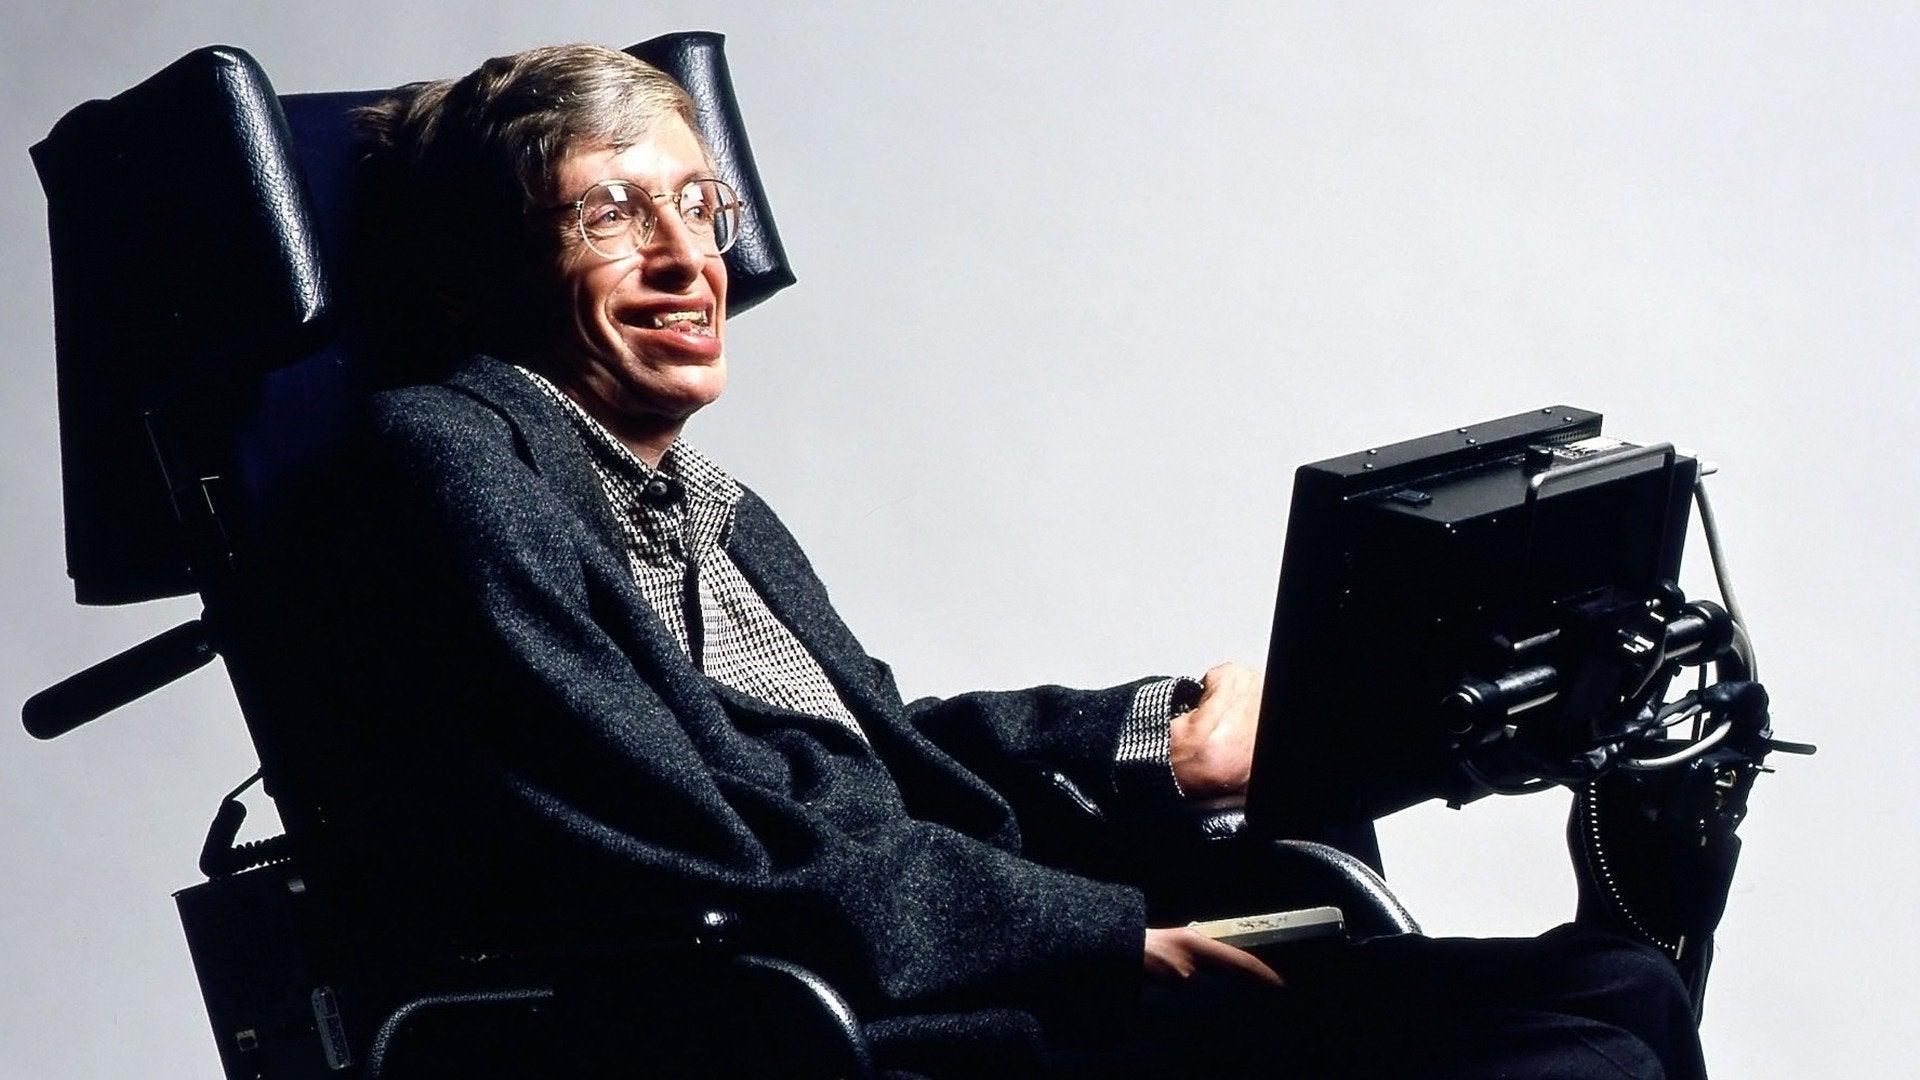 Professor Hawking's Universe